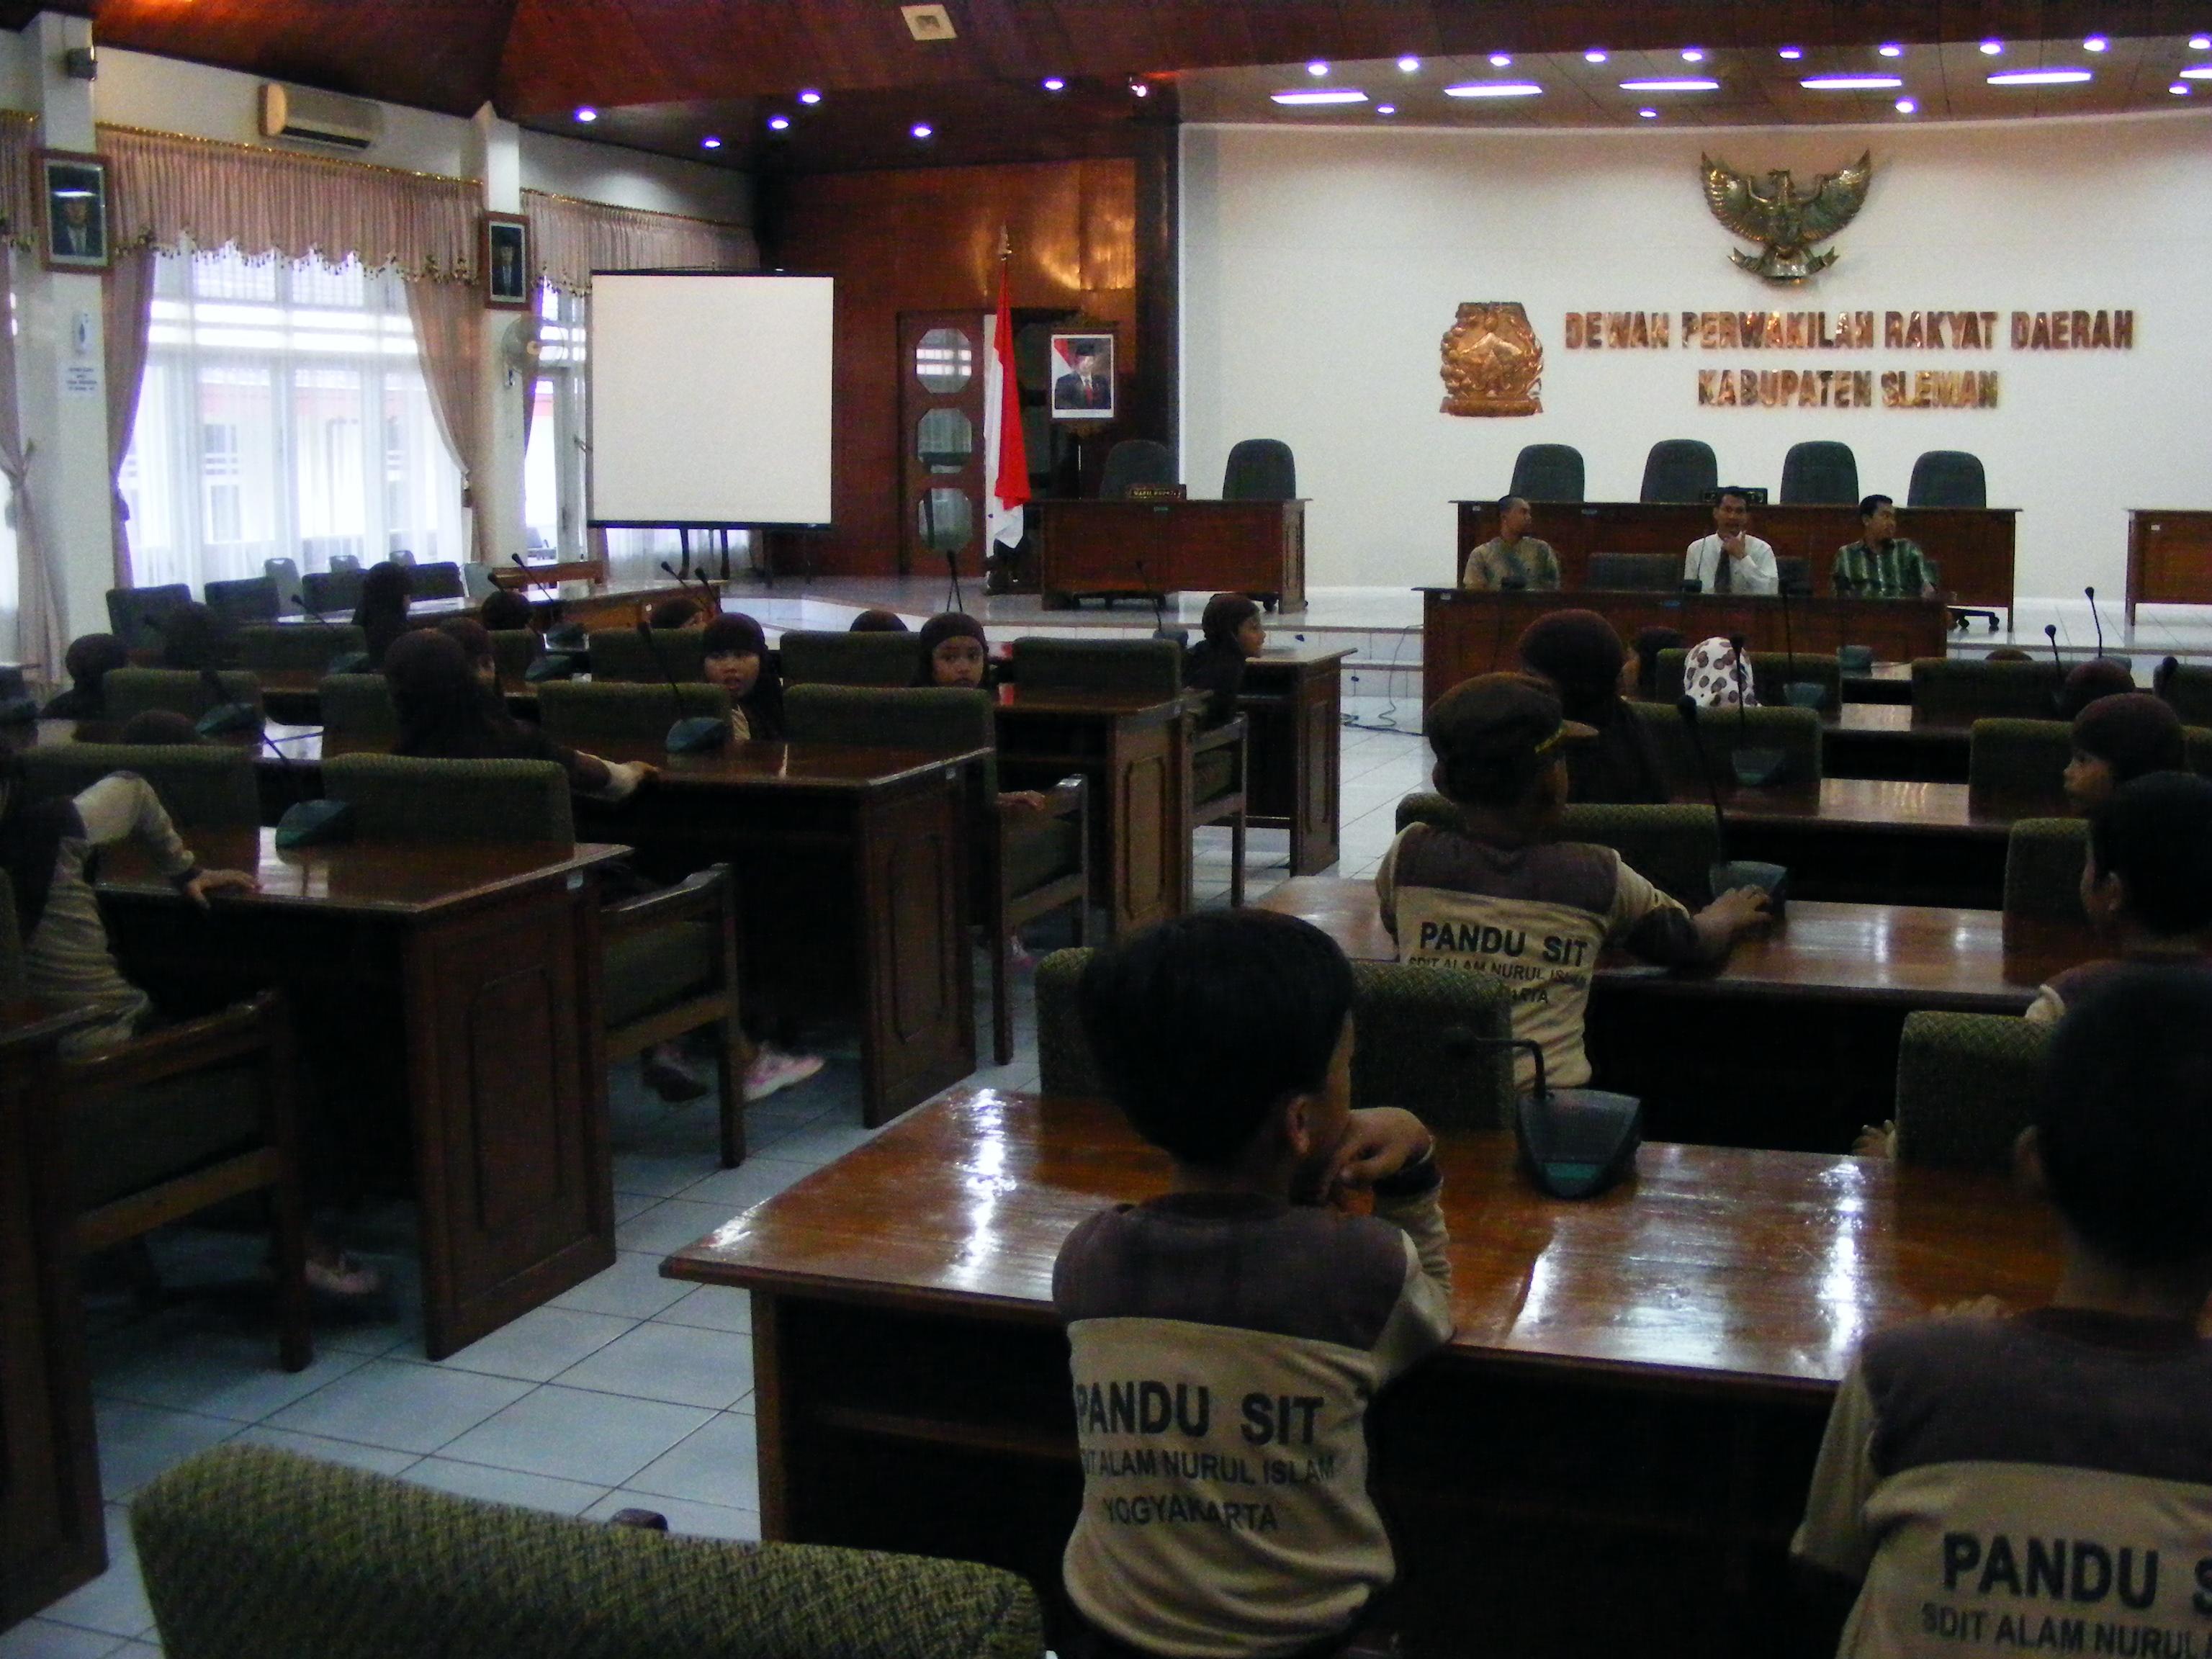 3072 x 2304 · 2977 kB · jpeg, Sekolah Alam Nurul Islam Yogyakarta